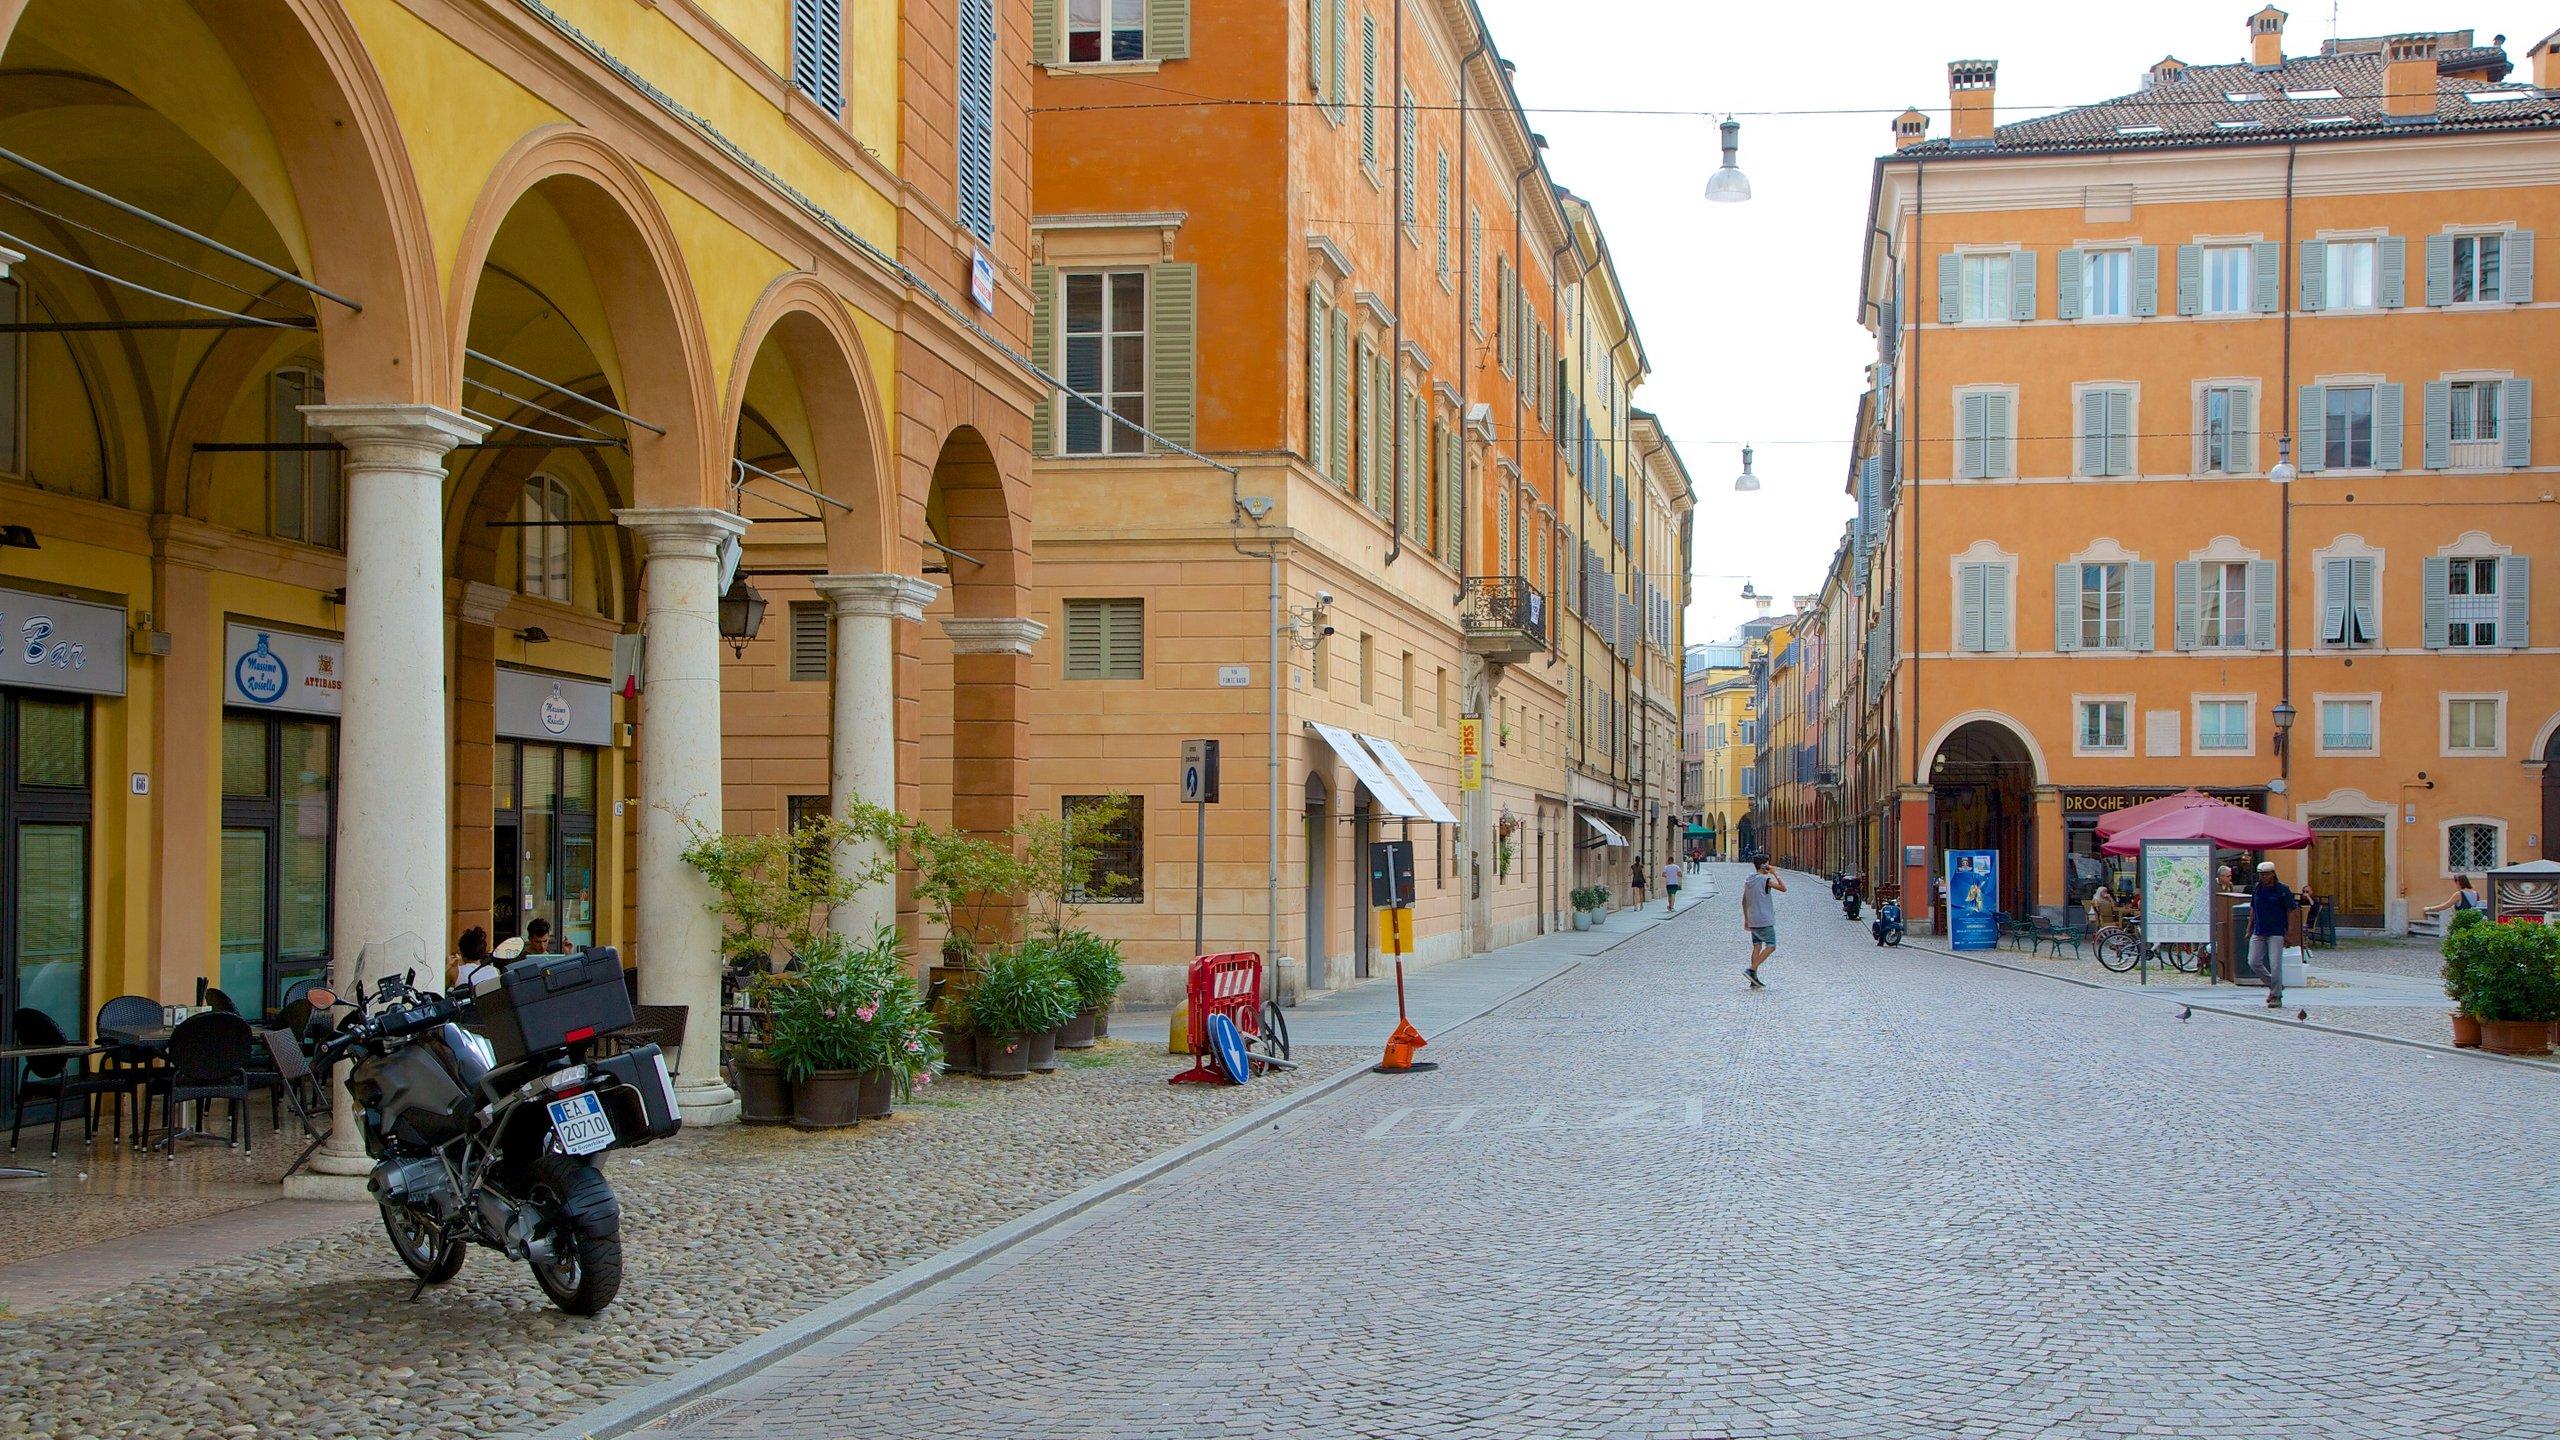 Modena (provincie), Emilia-Romagna, Italië